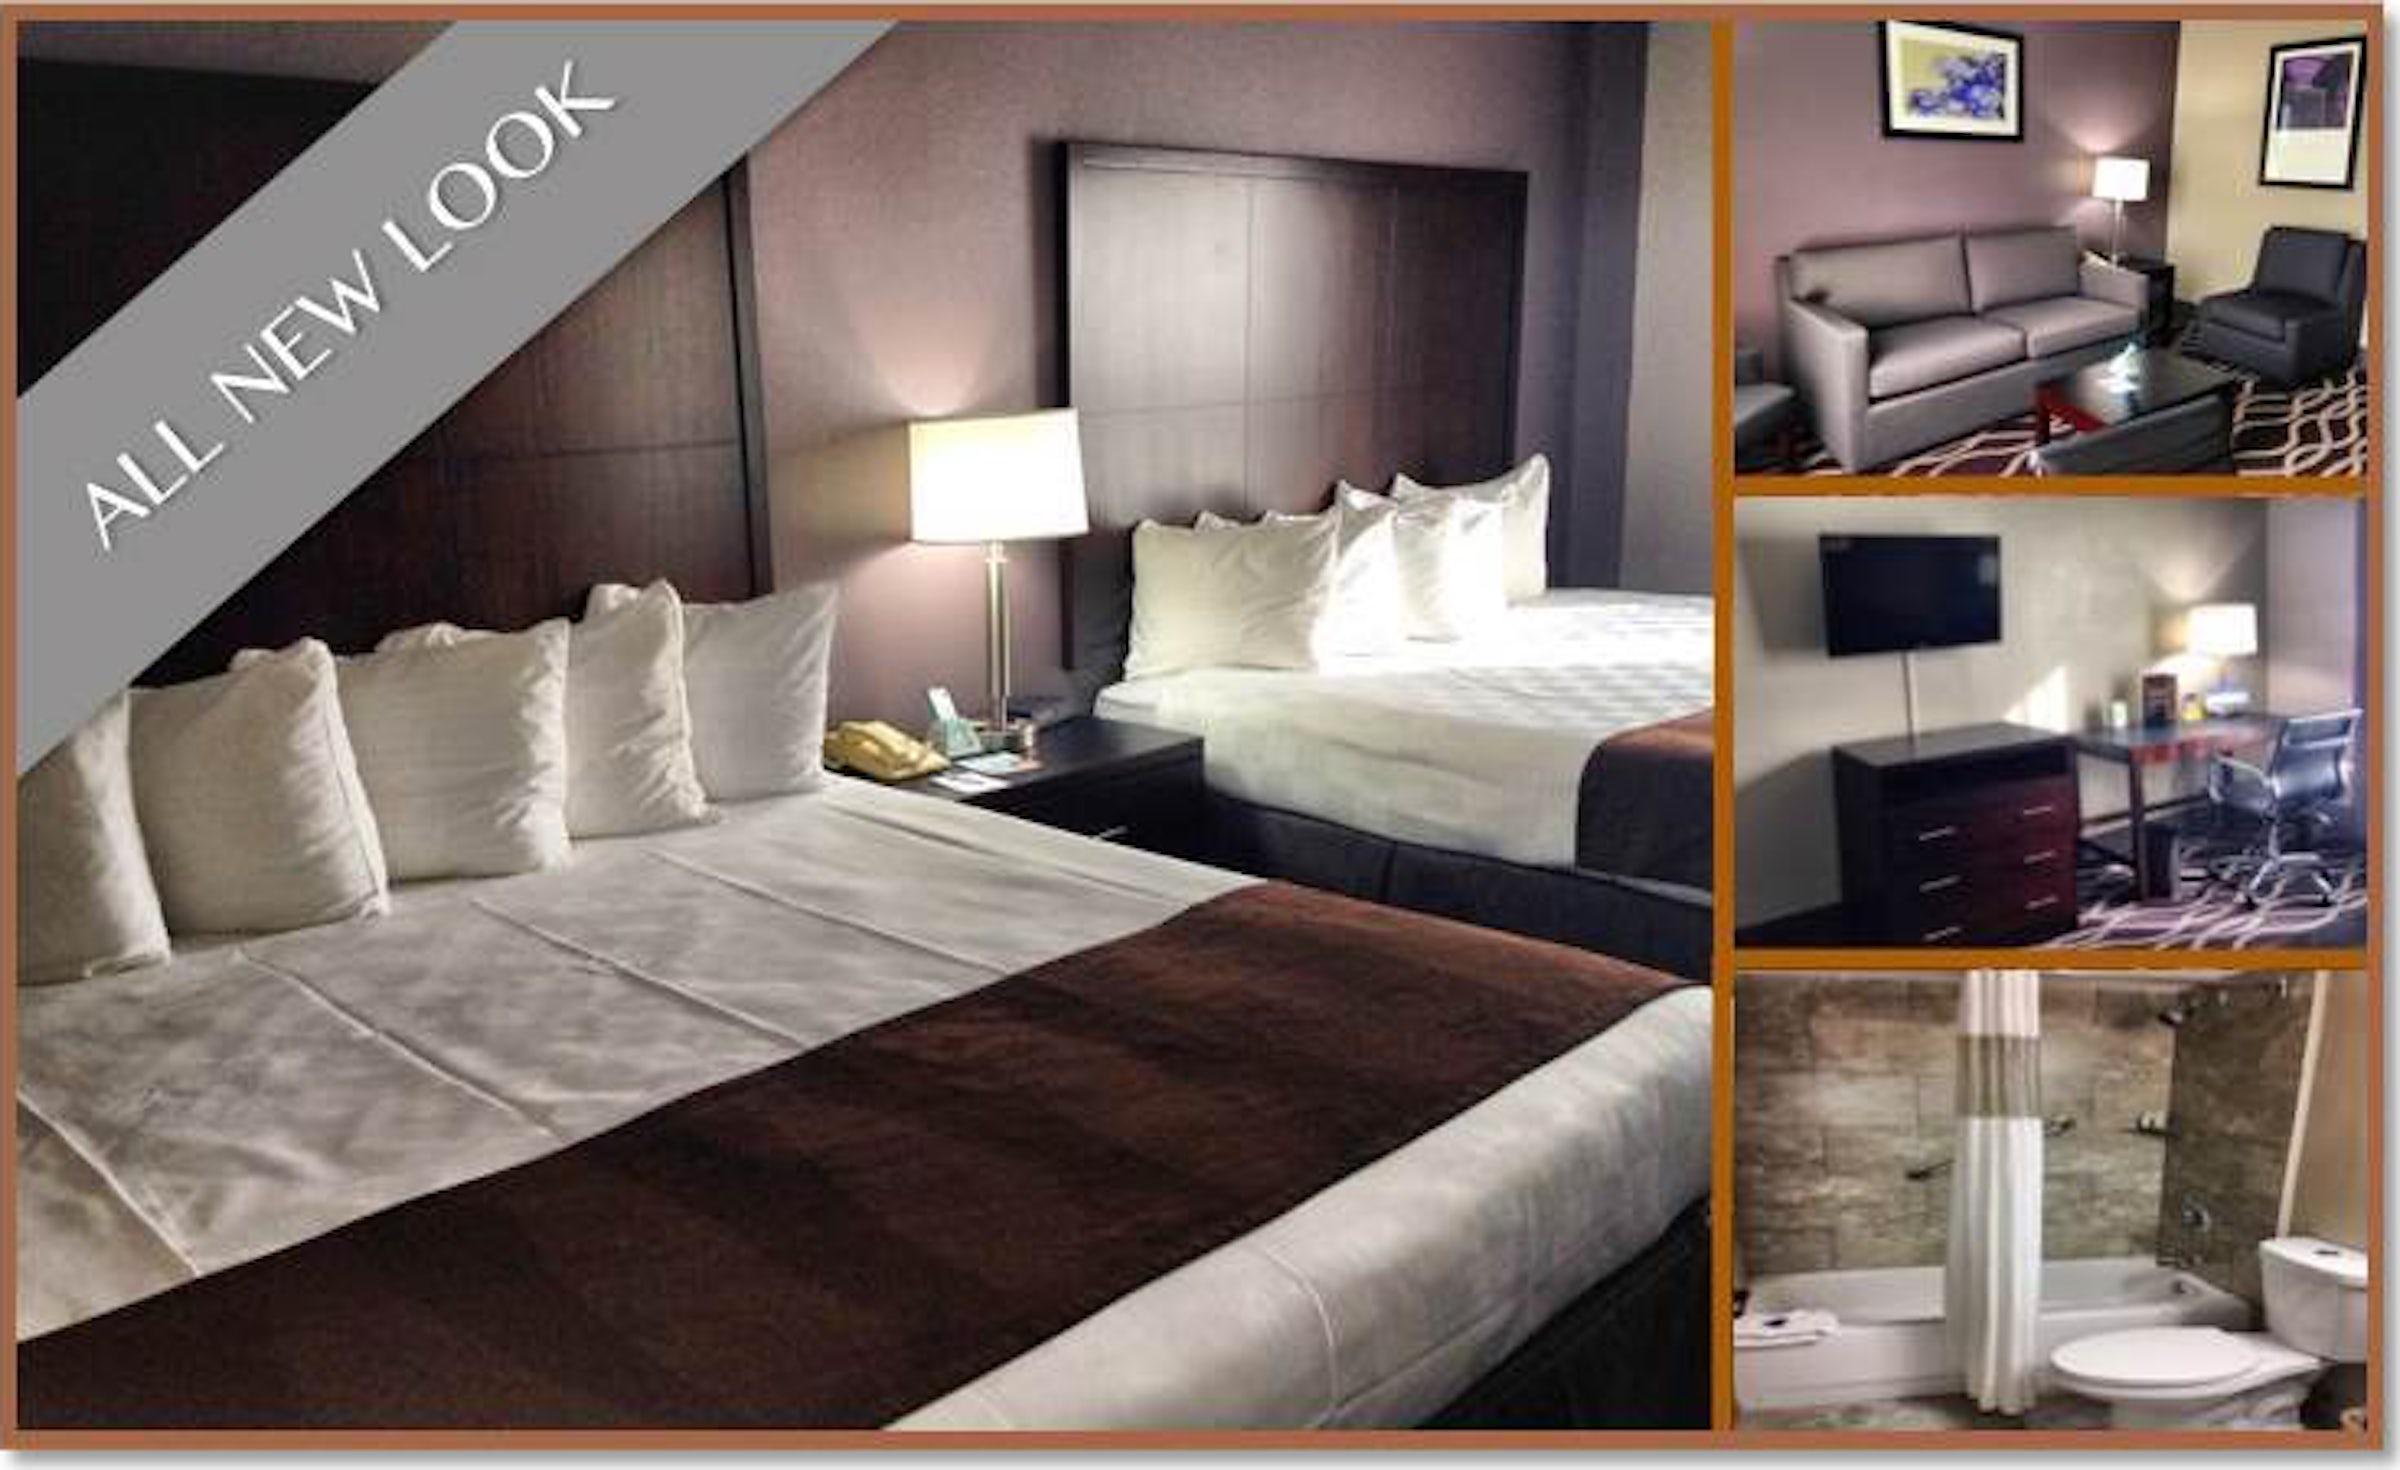 IBAN Hotel Dallas in Beyond Dallas